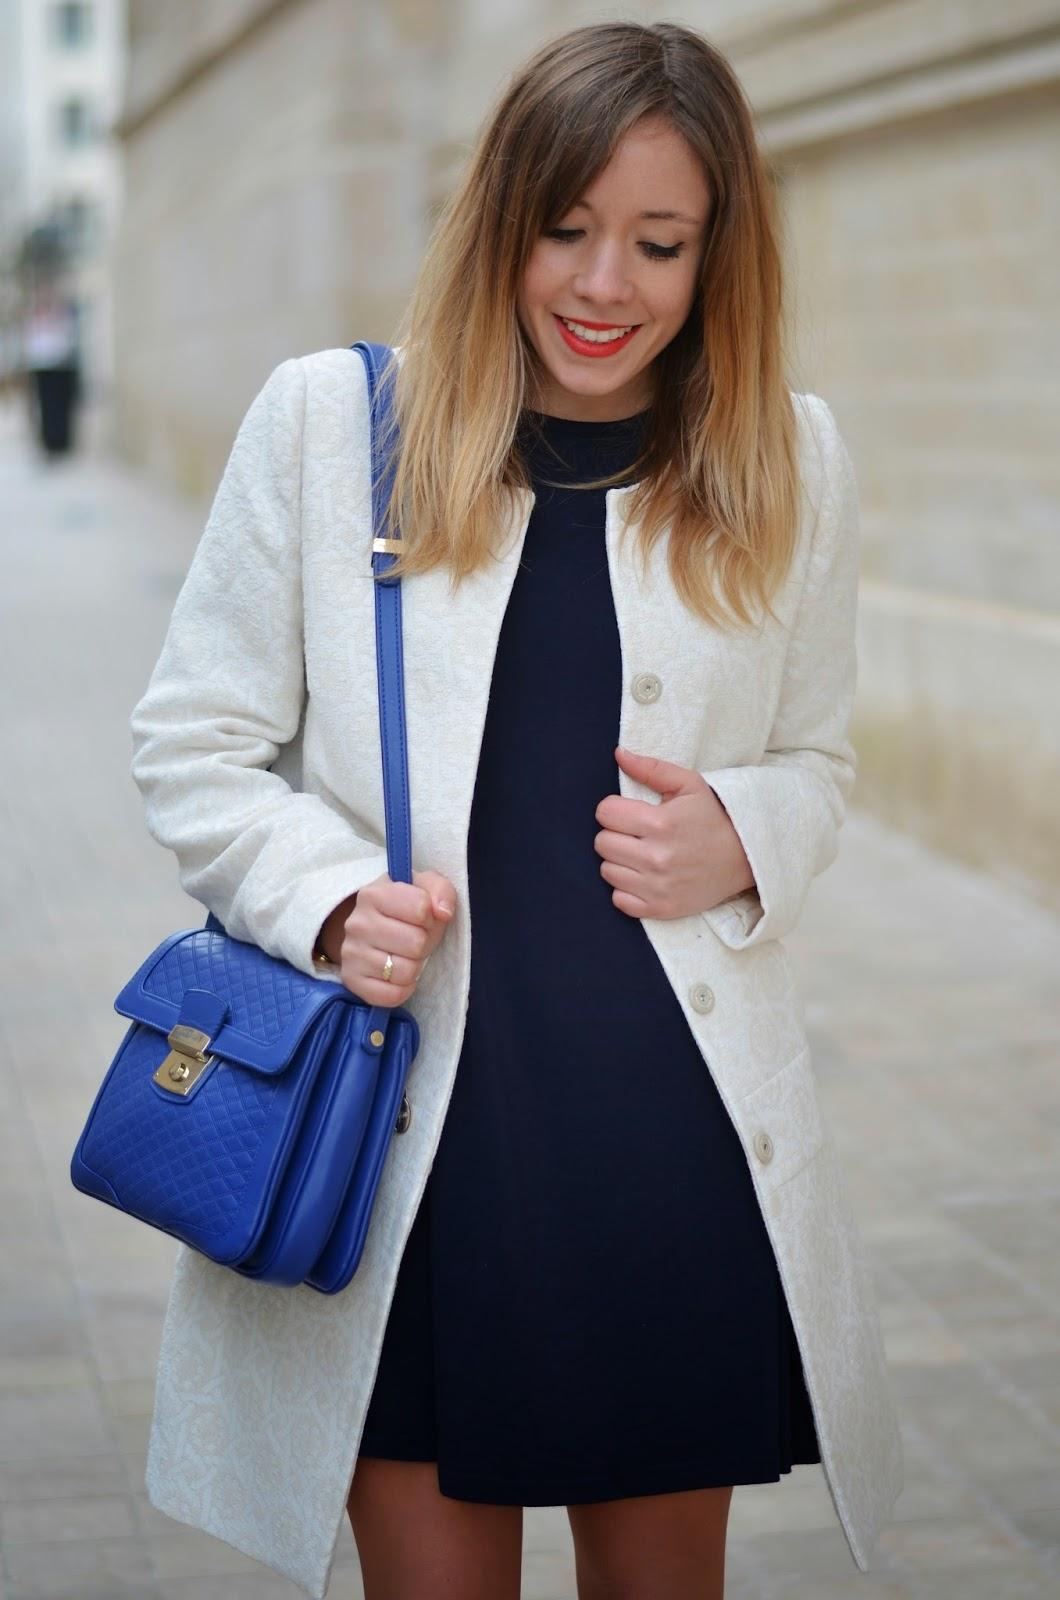 robe la mode robe bleu marine avec quelle chaussure. Black Bedroom Furniture Sets. Home Design Ideas